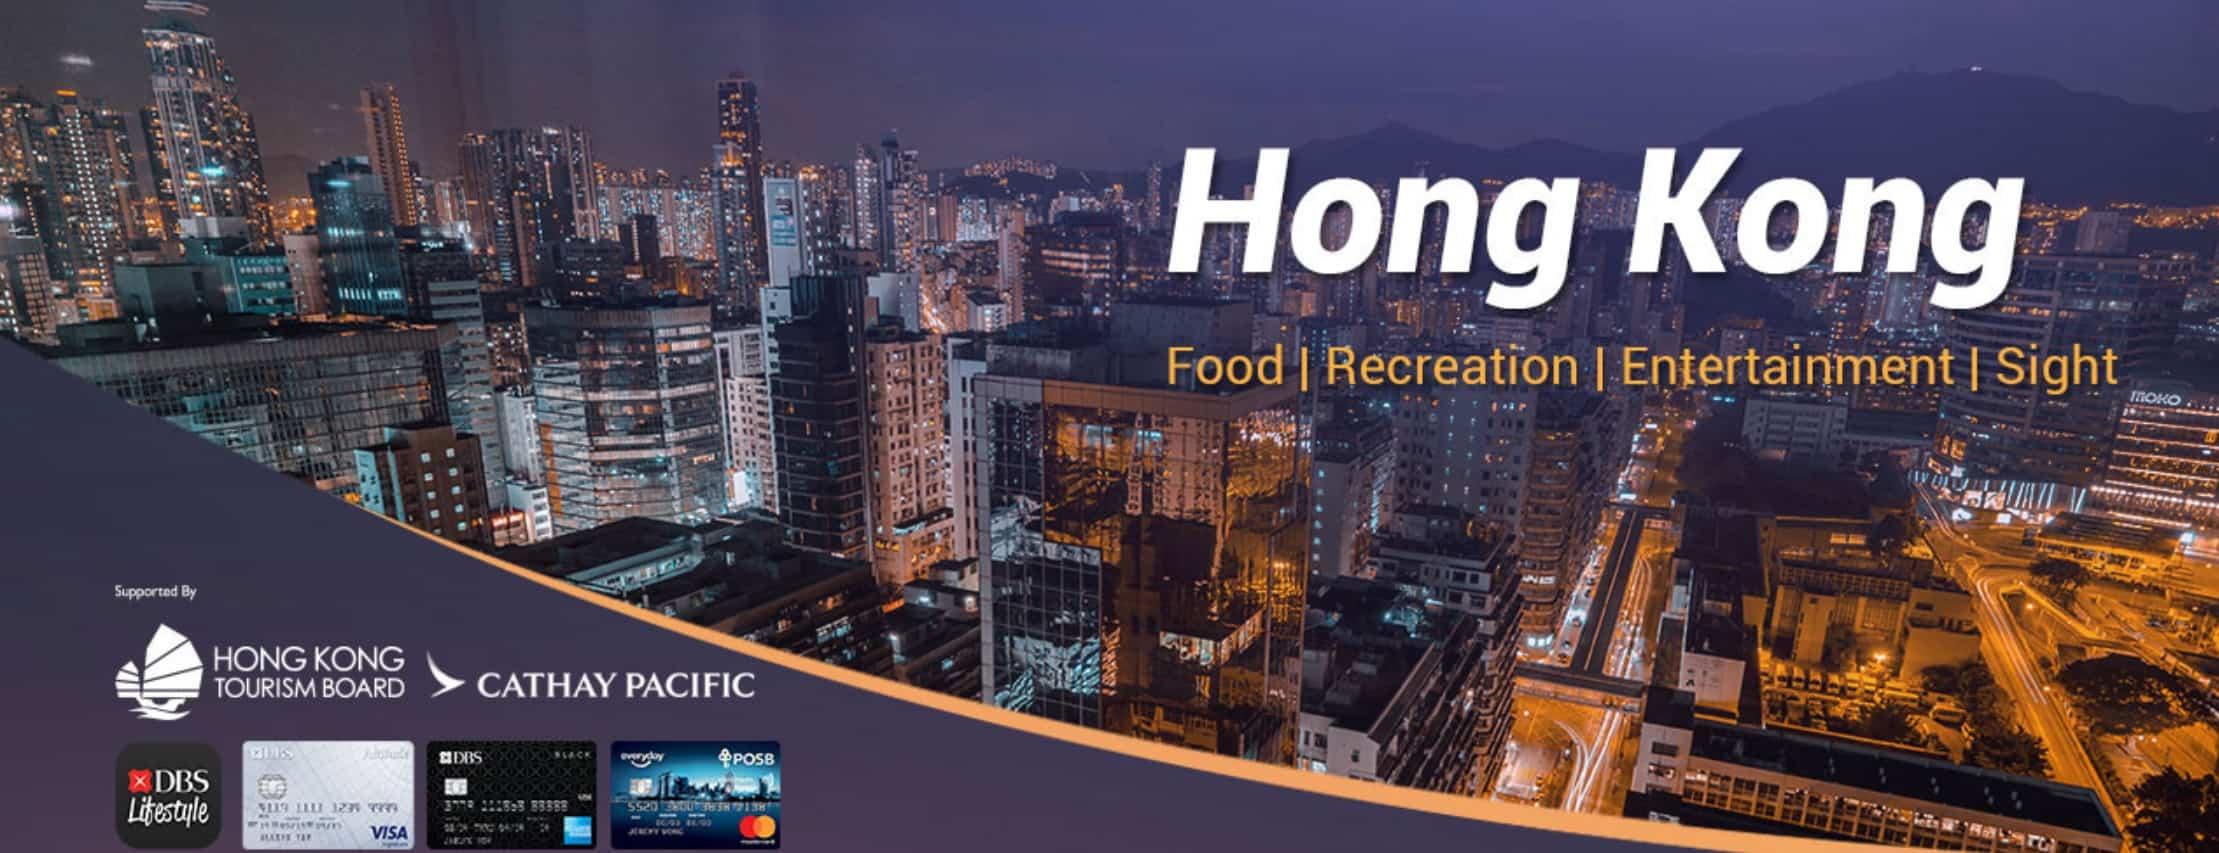 Trip.com Hong Kong 11.11